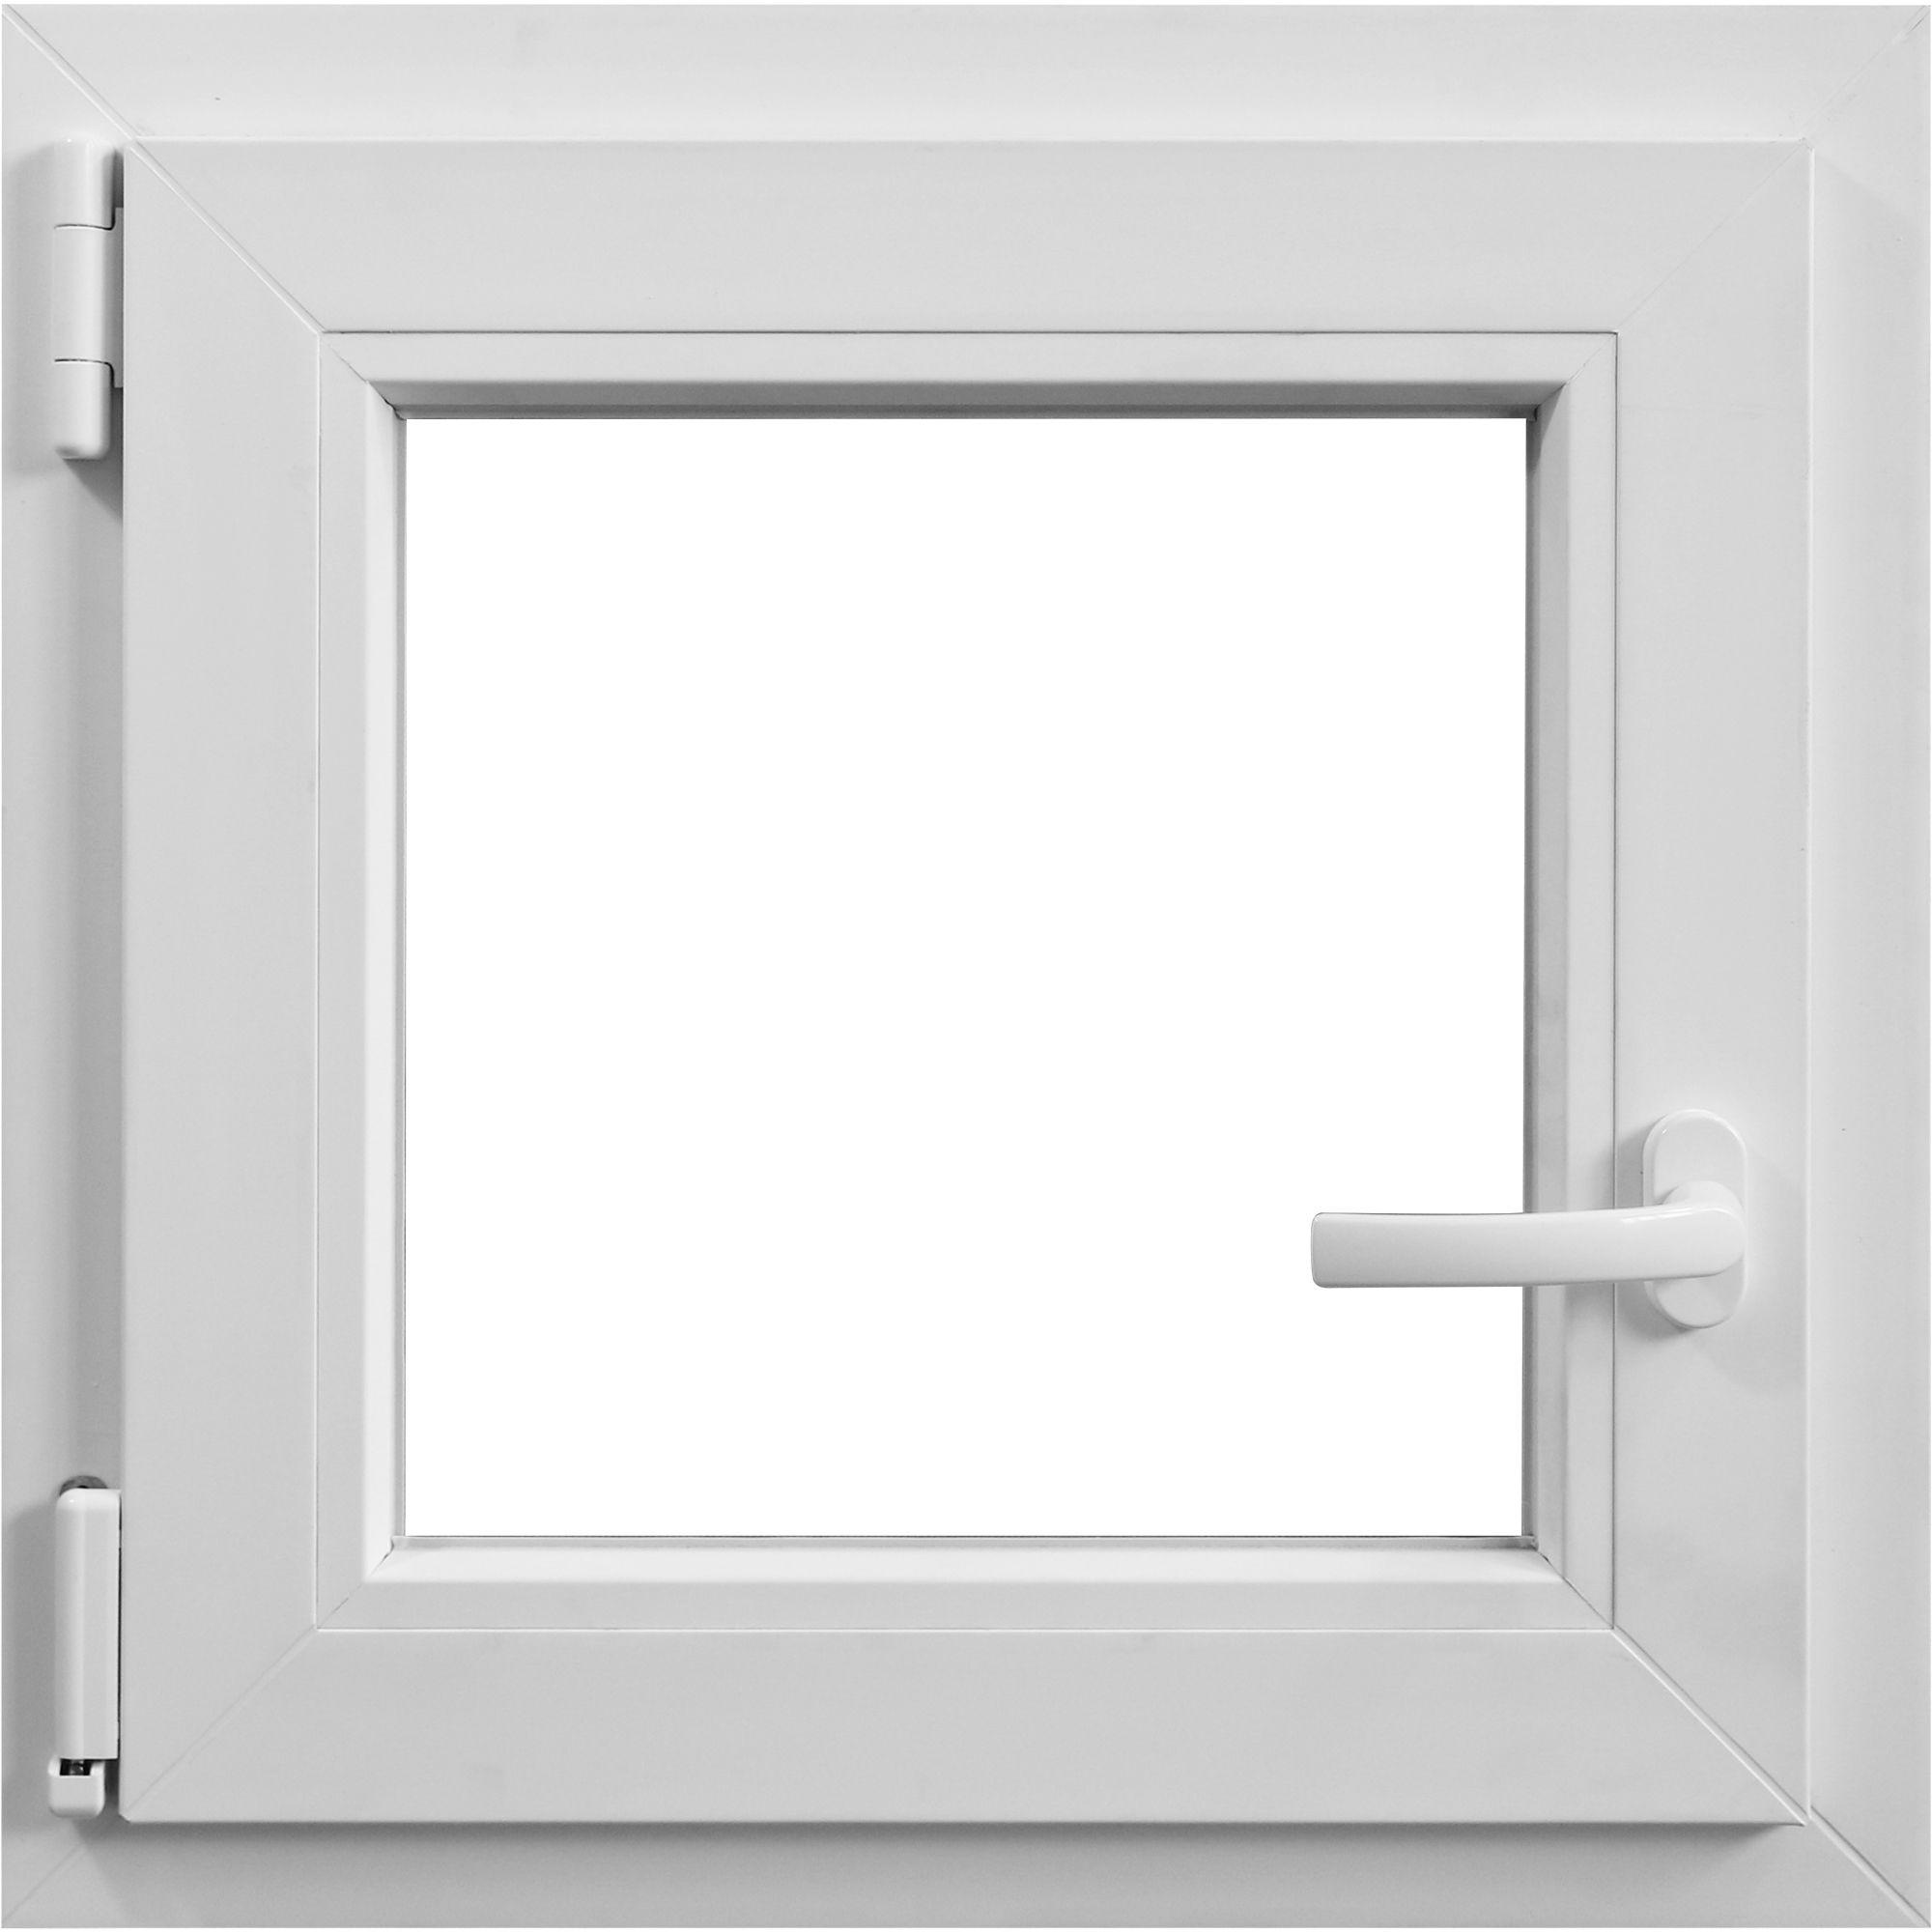 Fereastra PVC, 5 camere, alb, 56 x 56 cm imagine MatHaus.ro